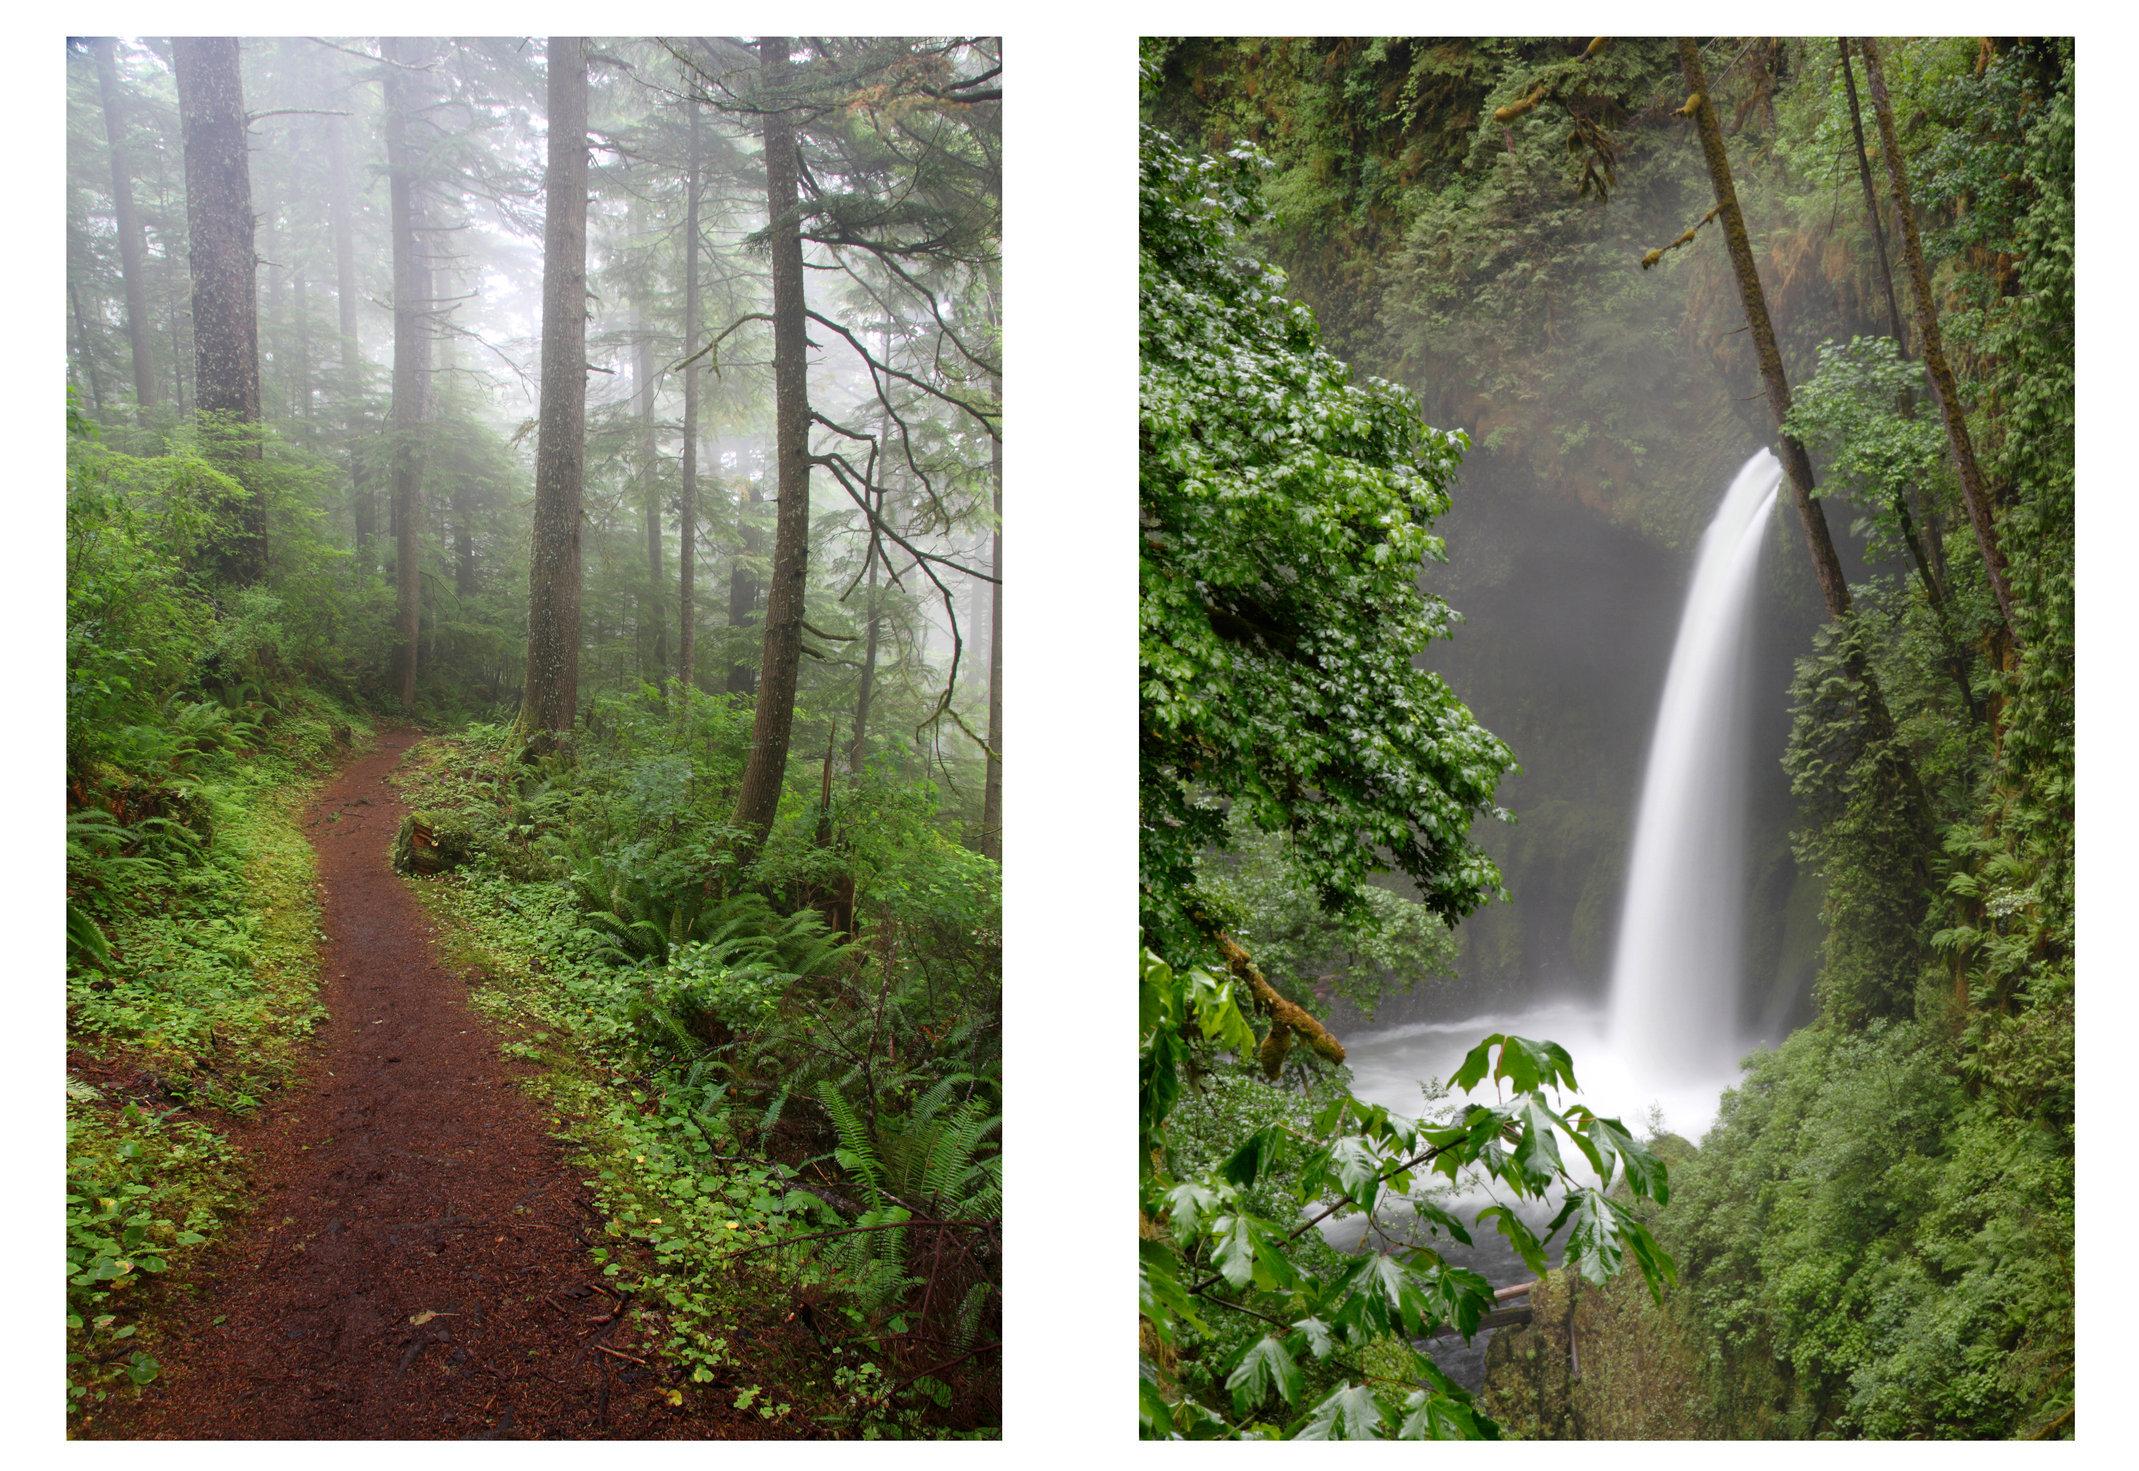 (left) Hiking Trail, Coastal Range, Oregon; (right) Metlako Falls, Columbia River Gorge, Oregon